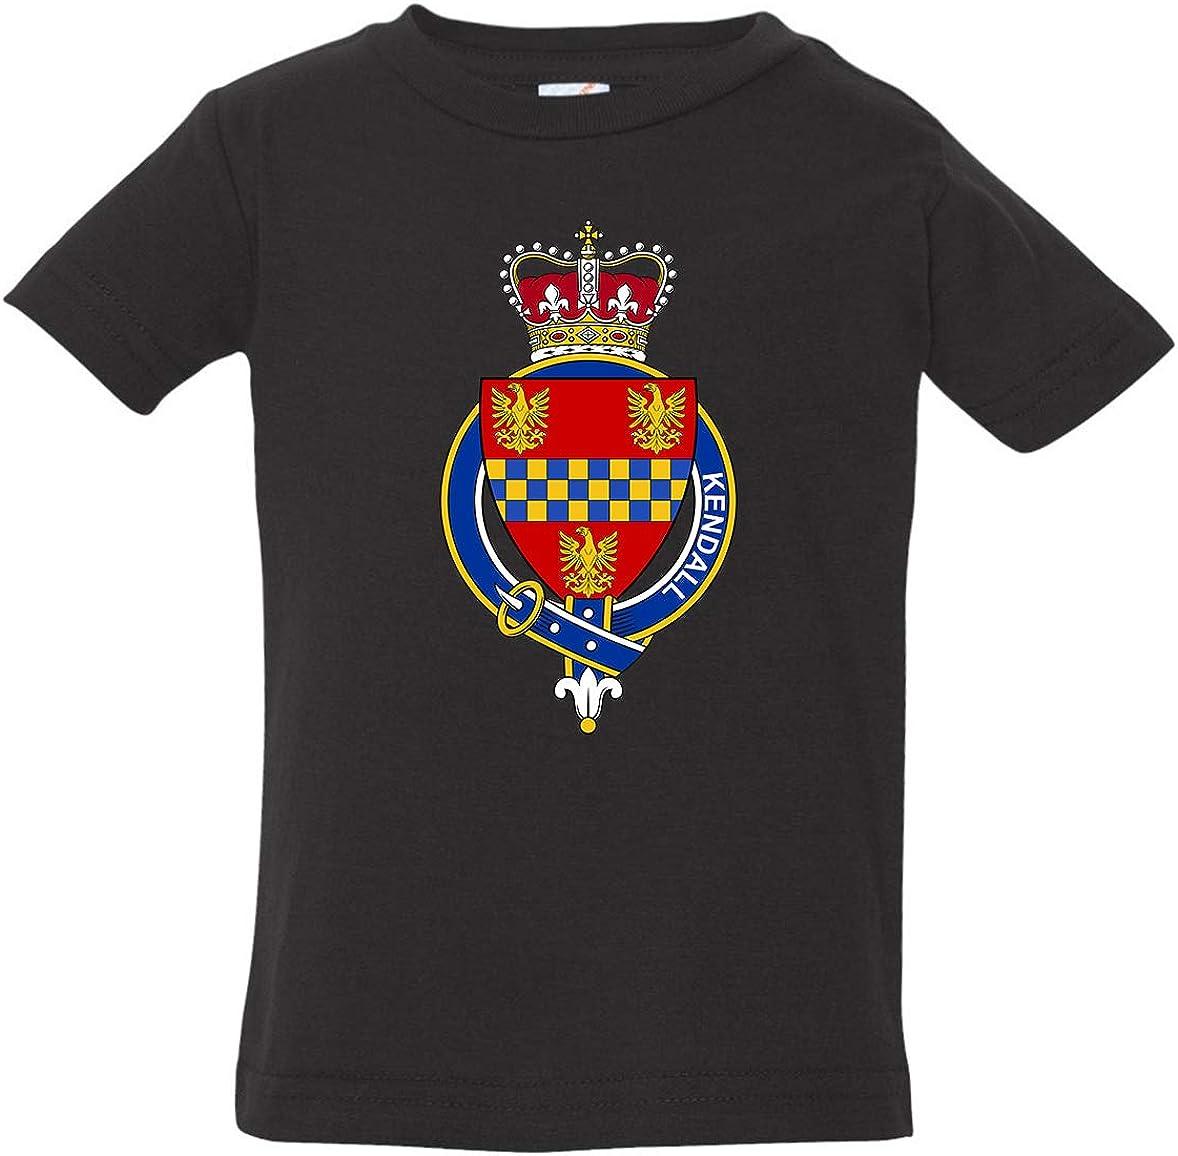 Tenacitee Babys English Garter Family Kendall Shirt